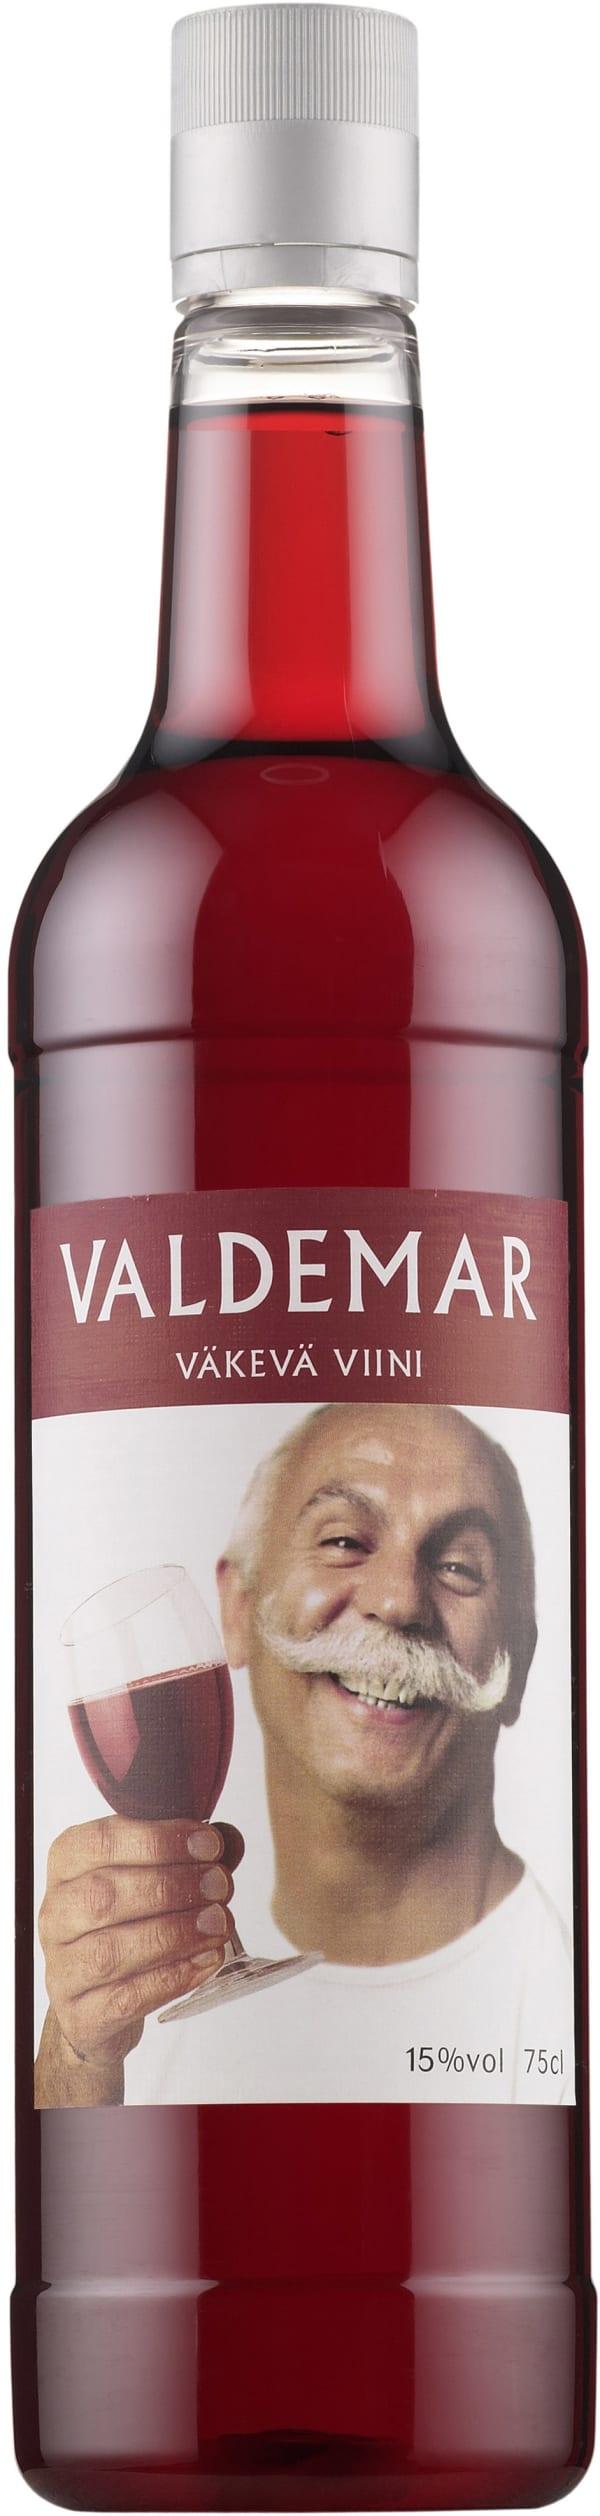 Valdemar  muovipullo